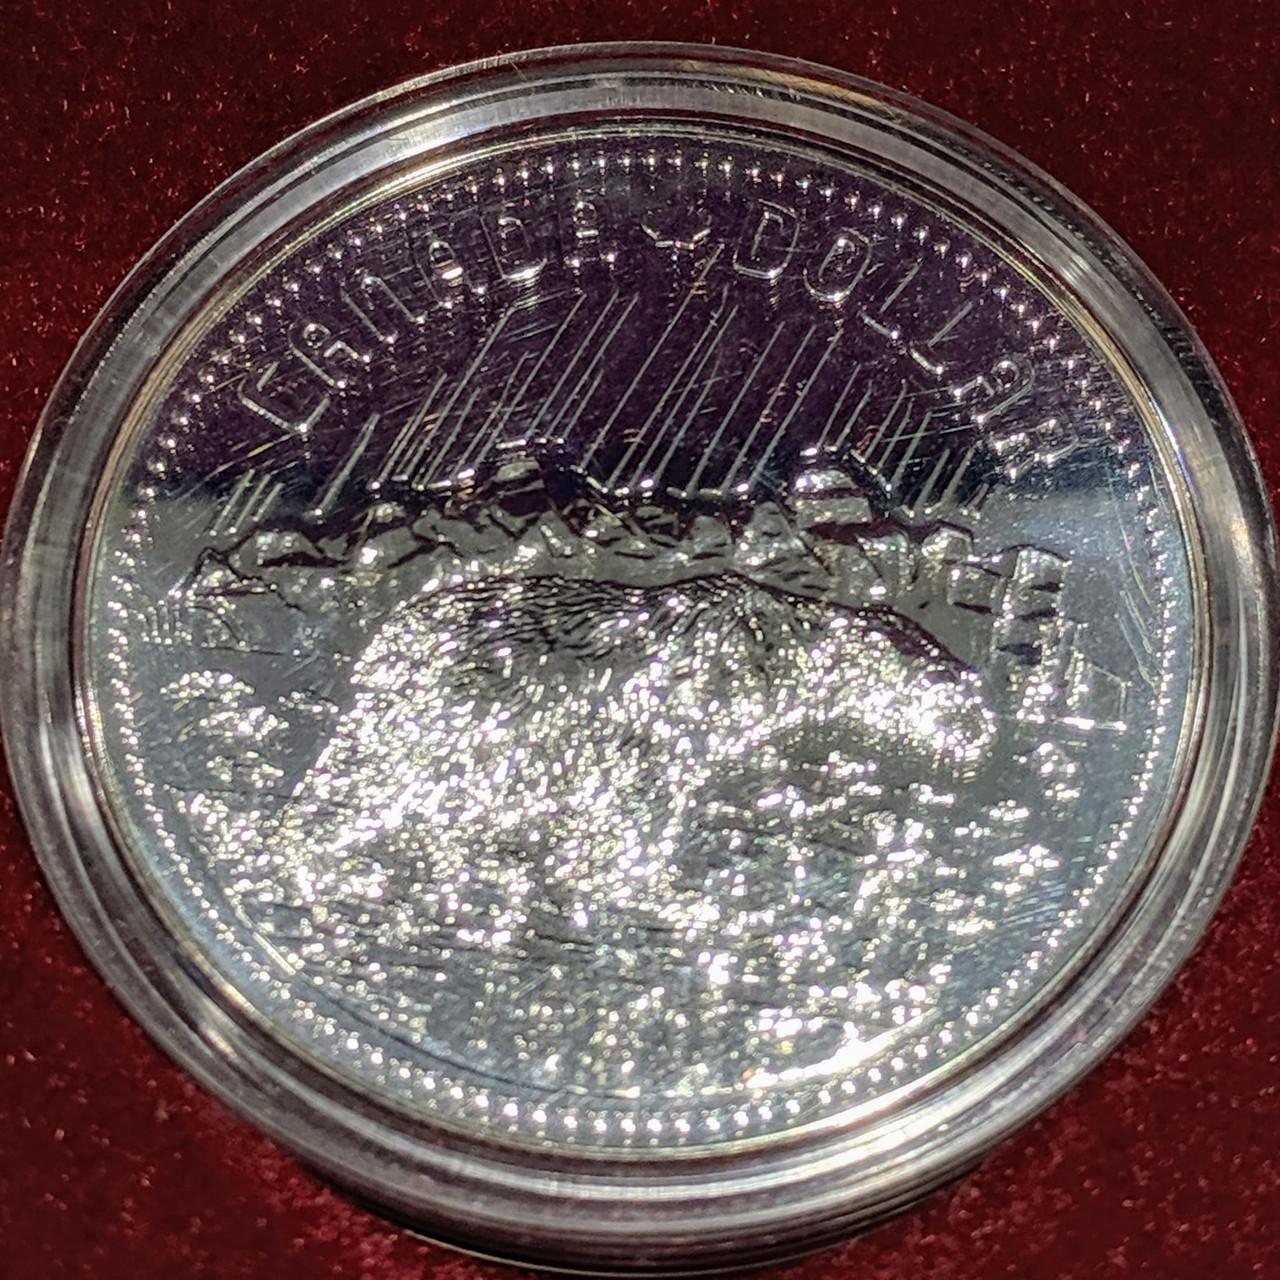 1980 CANADA 5 CENTS SPECIMEN NICKEL COIN